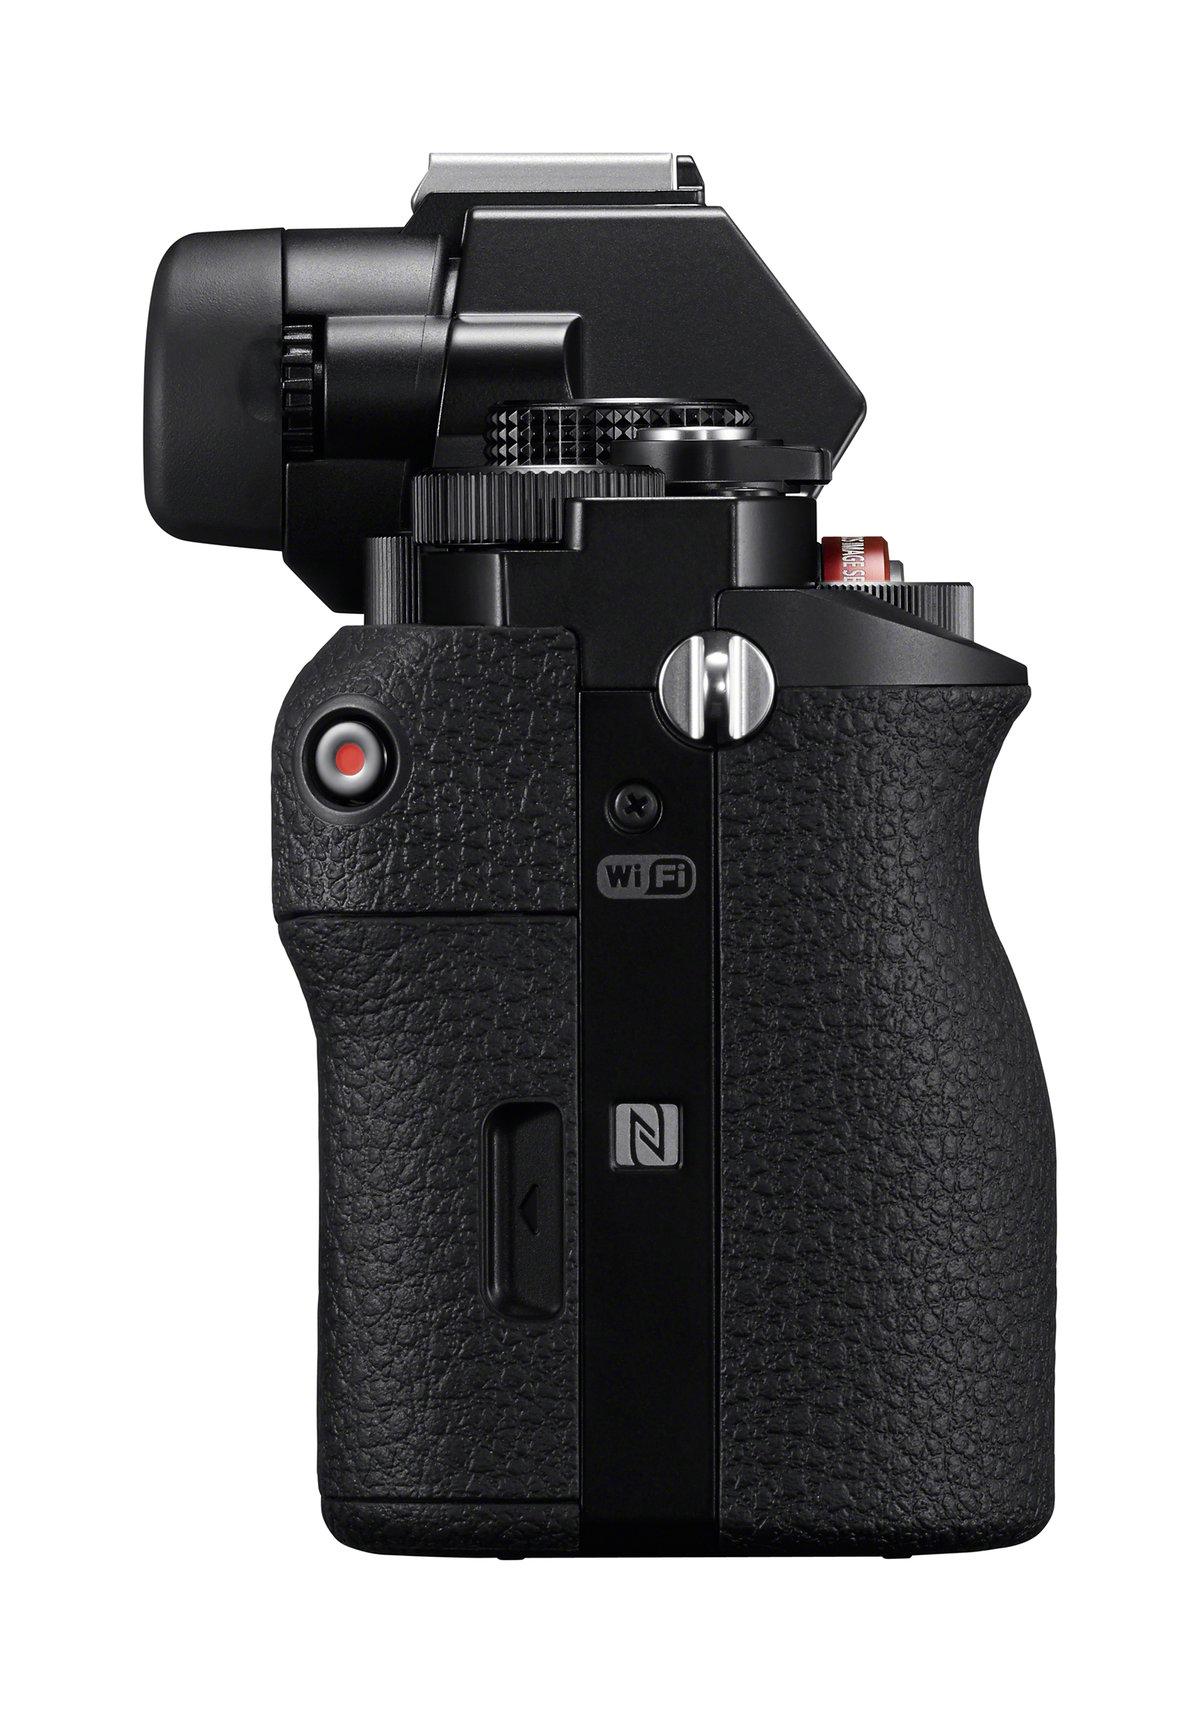 Sony Alpha 7 Mirrorless Camera with 28-70mm Lens Kit   Mirrorless Camera  Kits - Best Buy Canada 8b5882e35fb14